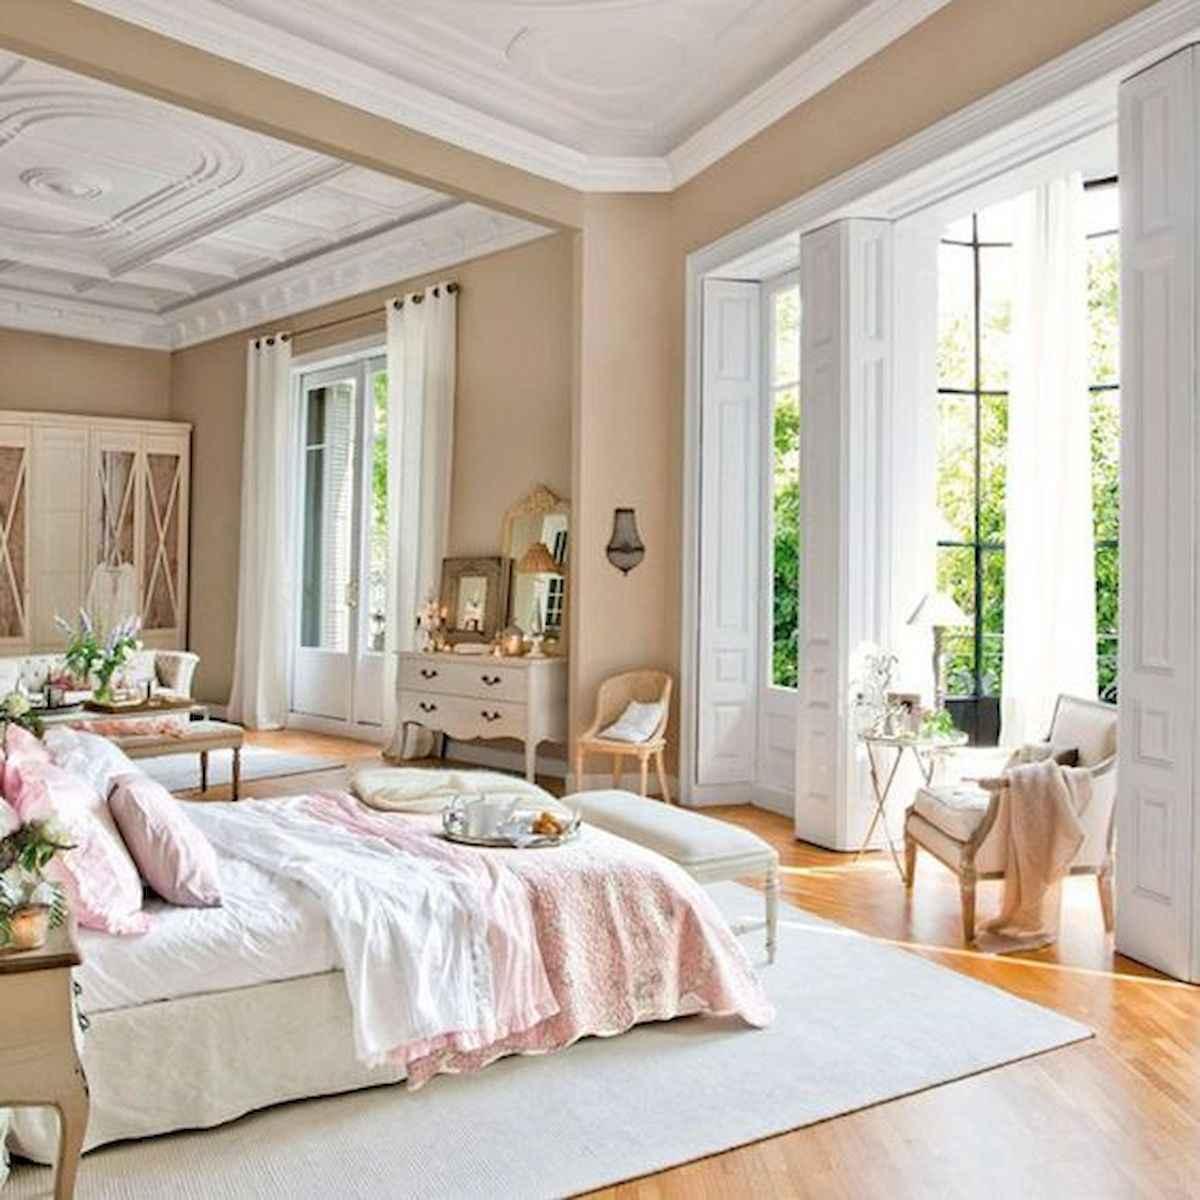 120 Awesome Farmhouse Master Bedroom Decor Ideas (30)